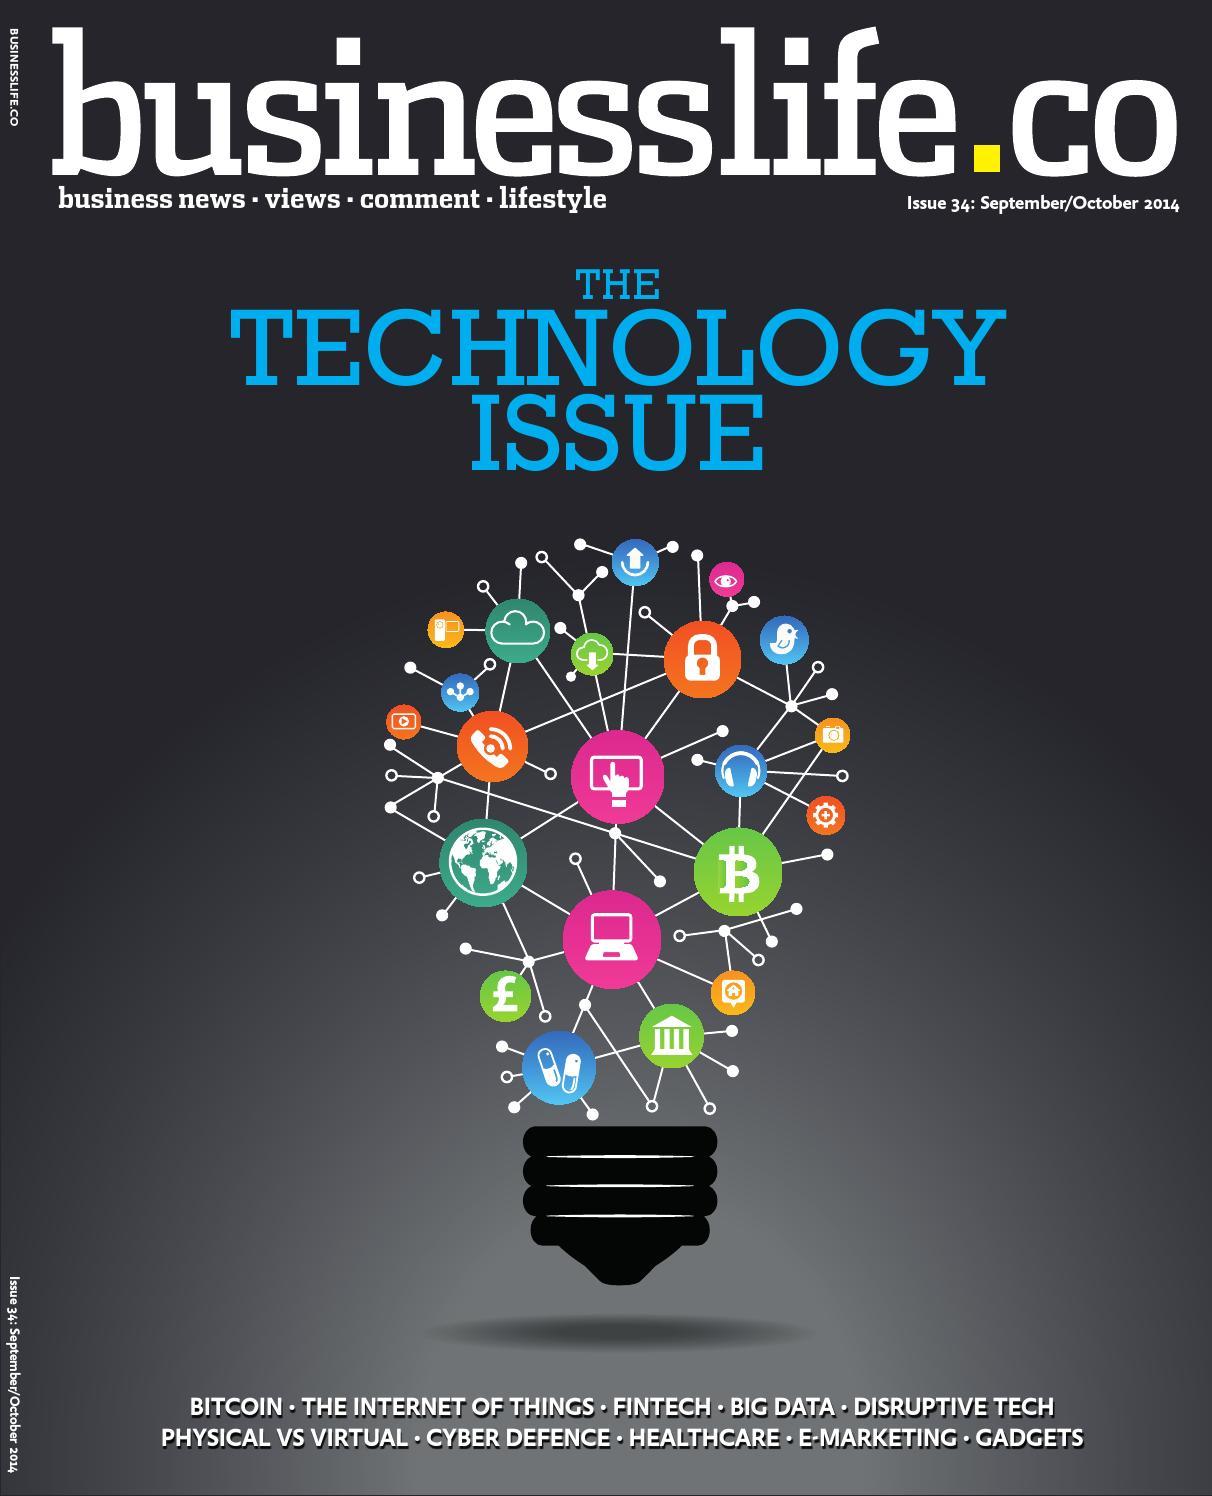 businesslife co Issue 34 September/October 2014 by BL